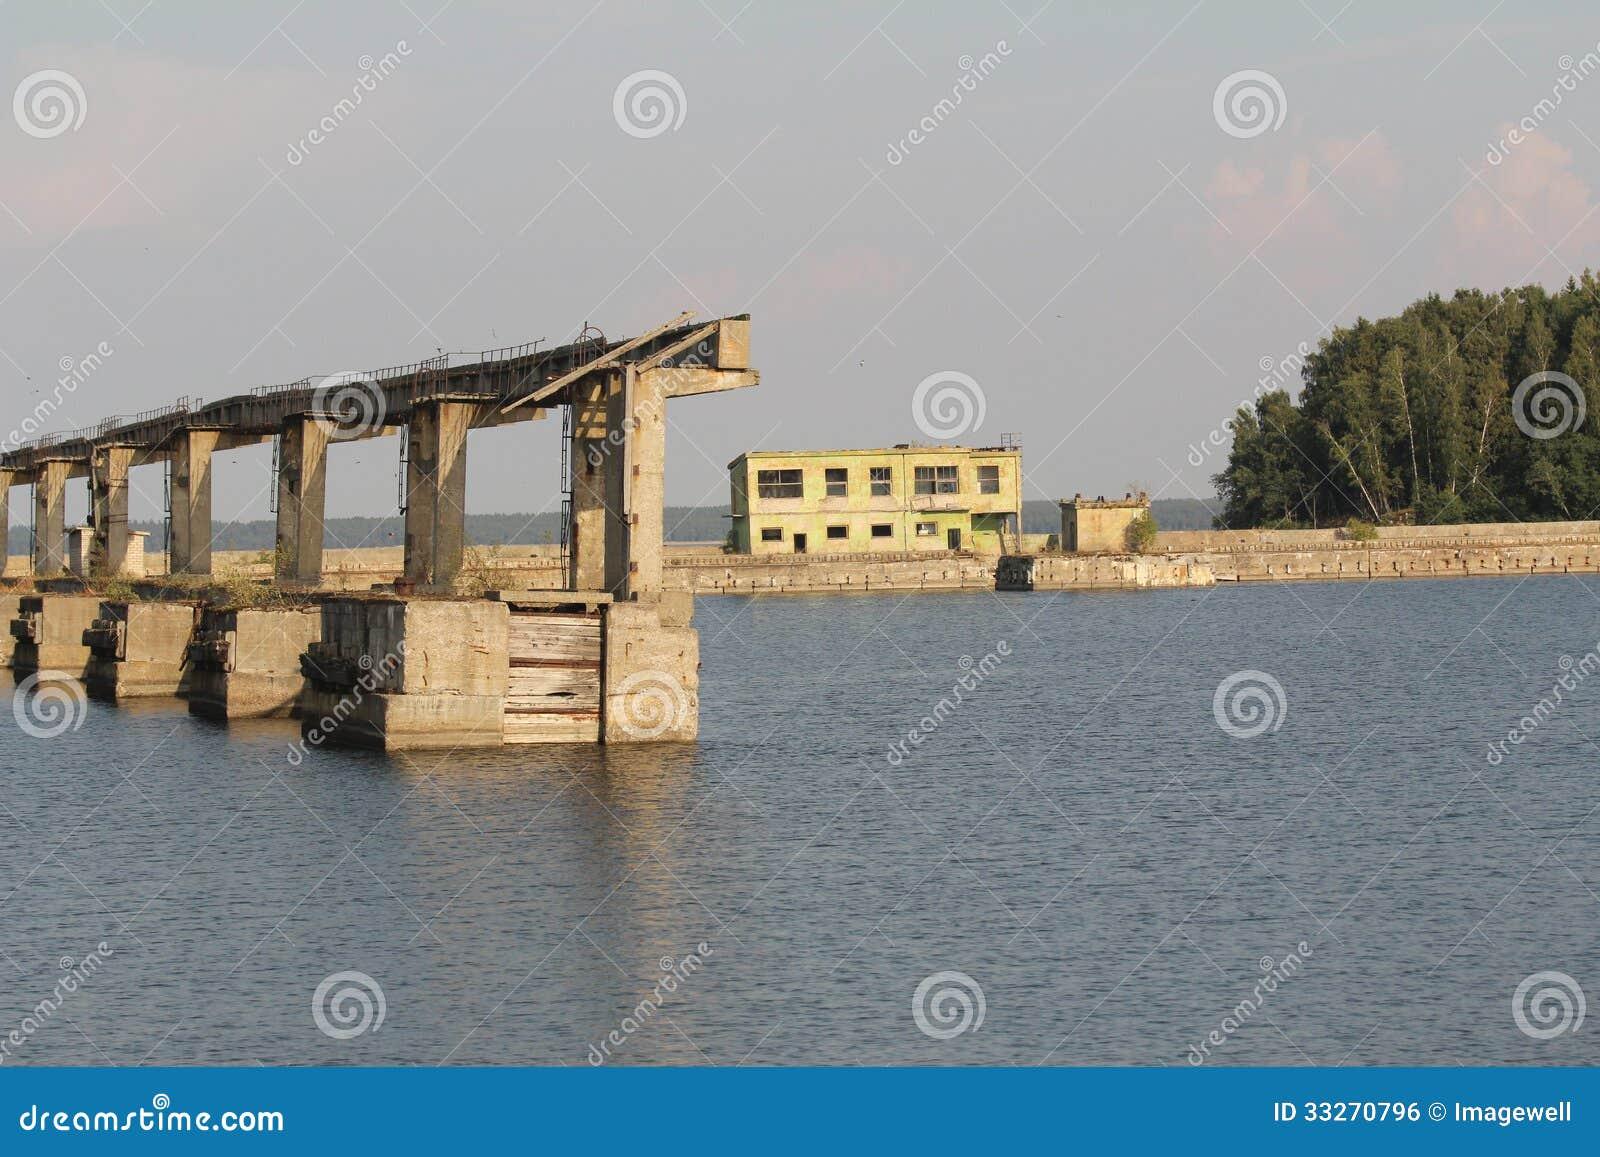 Former submarine base